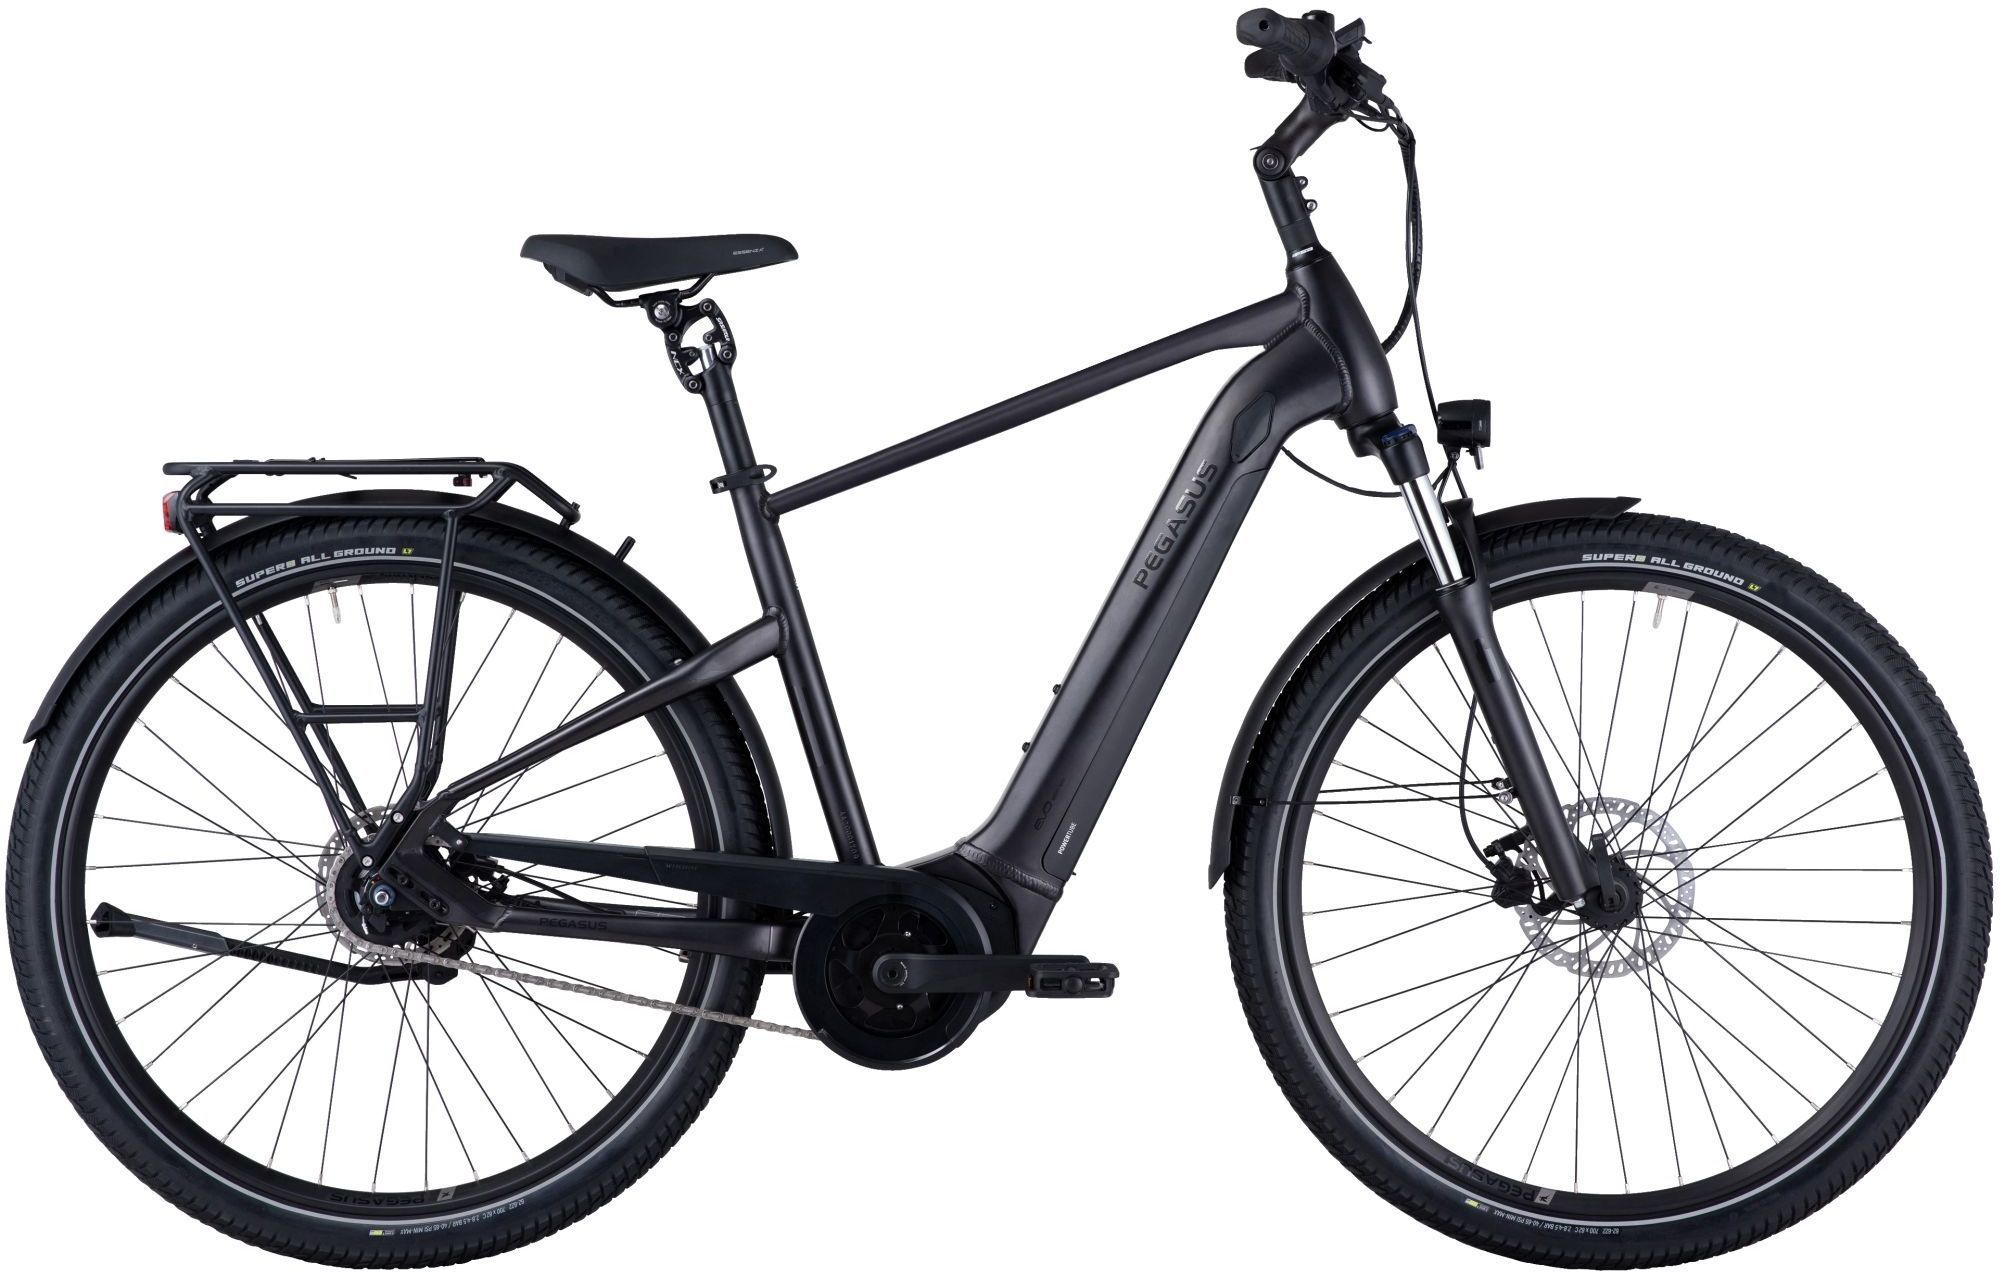 E-Bikes/Citybikes: Diamant  Savino EVO 5R Performance (500 Wh) 5 Gang Nabenschaltung Herrenfahrrad Diamant Modell 2021 28 Zoll 40 cm shimano gr